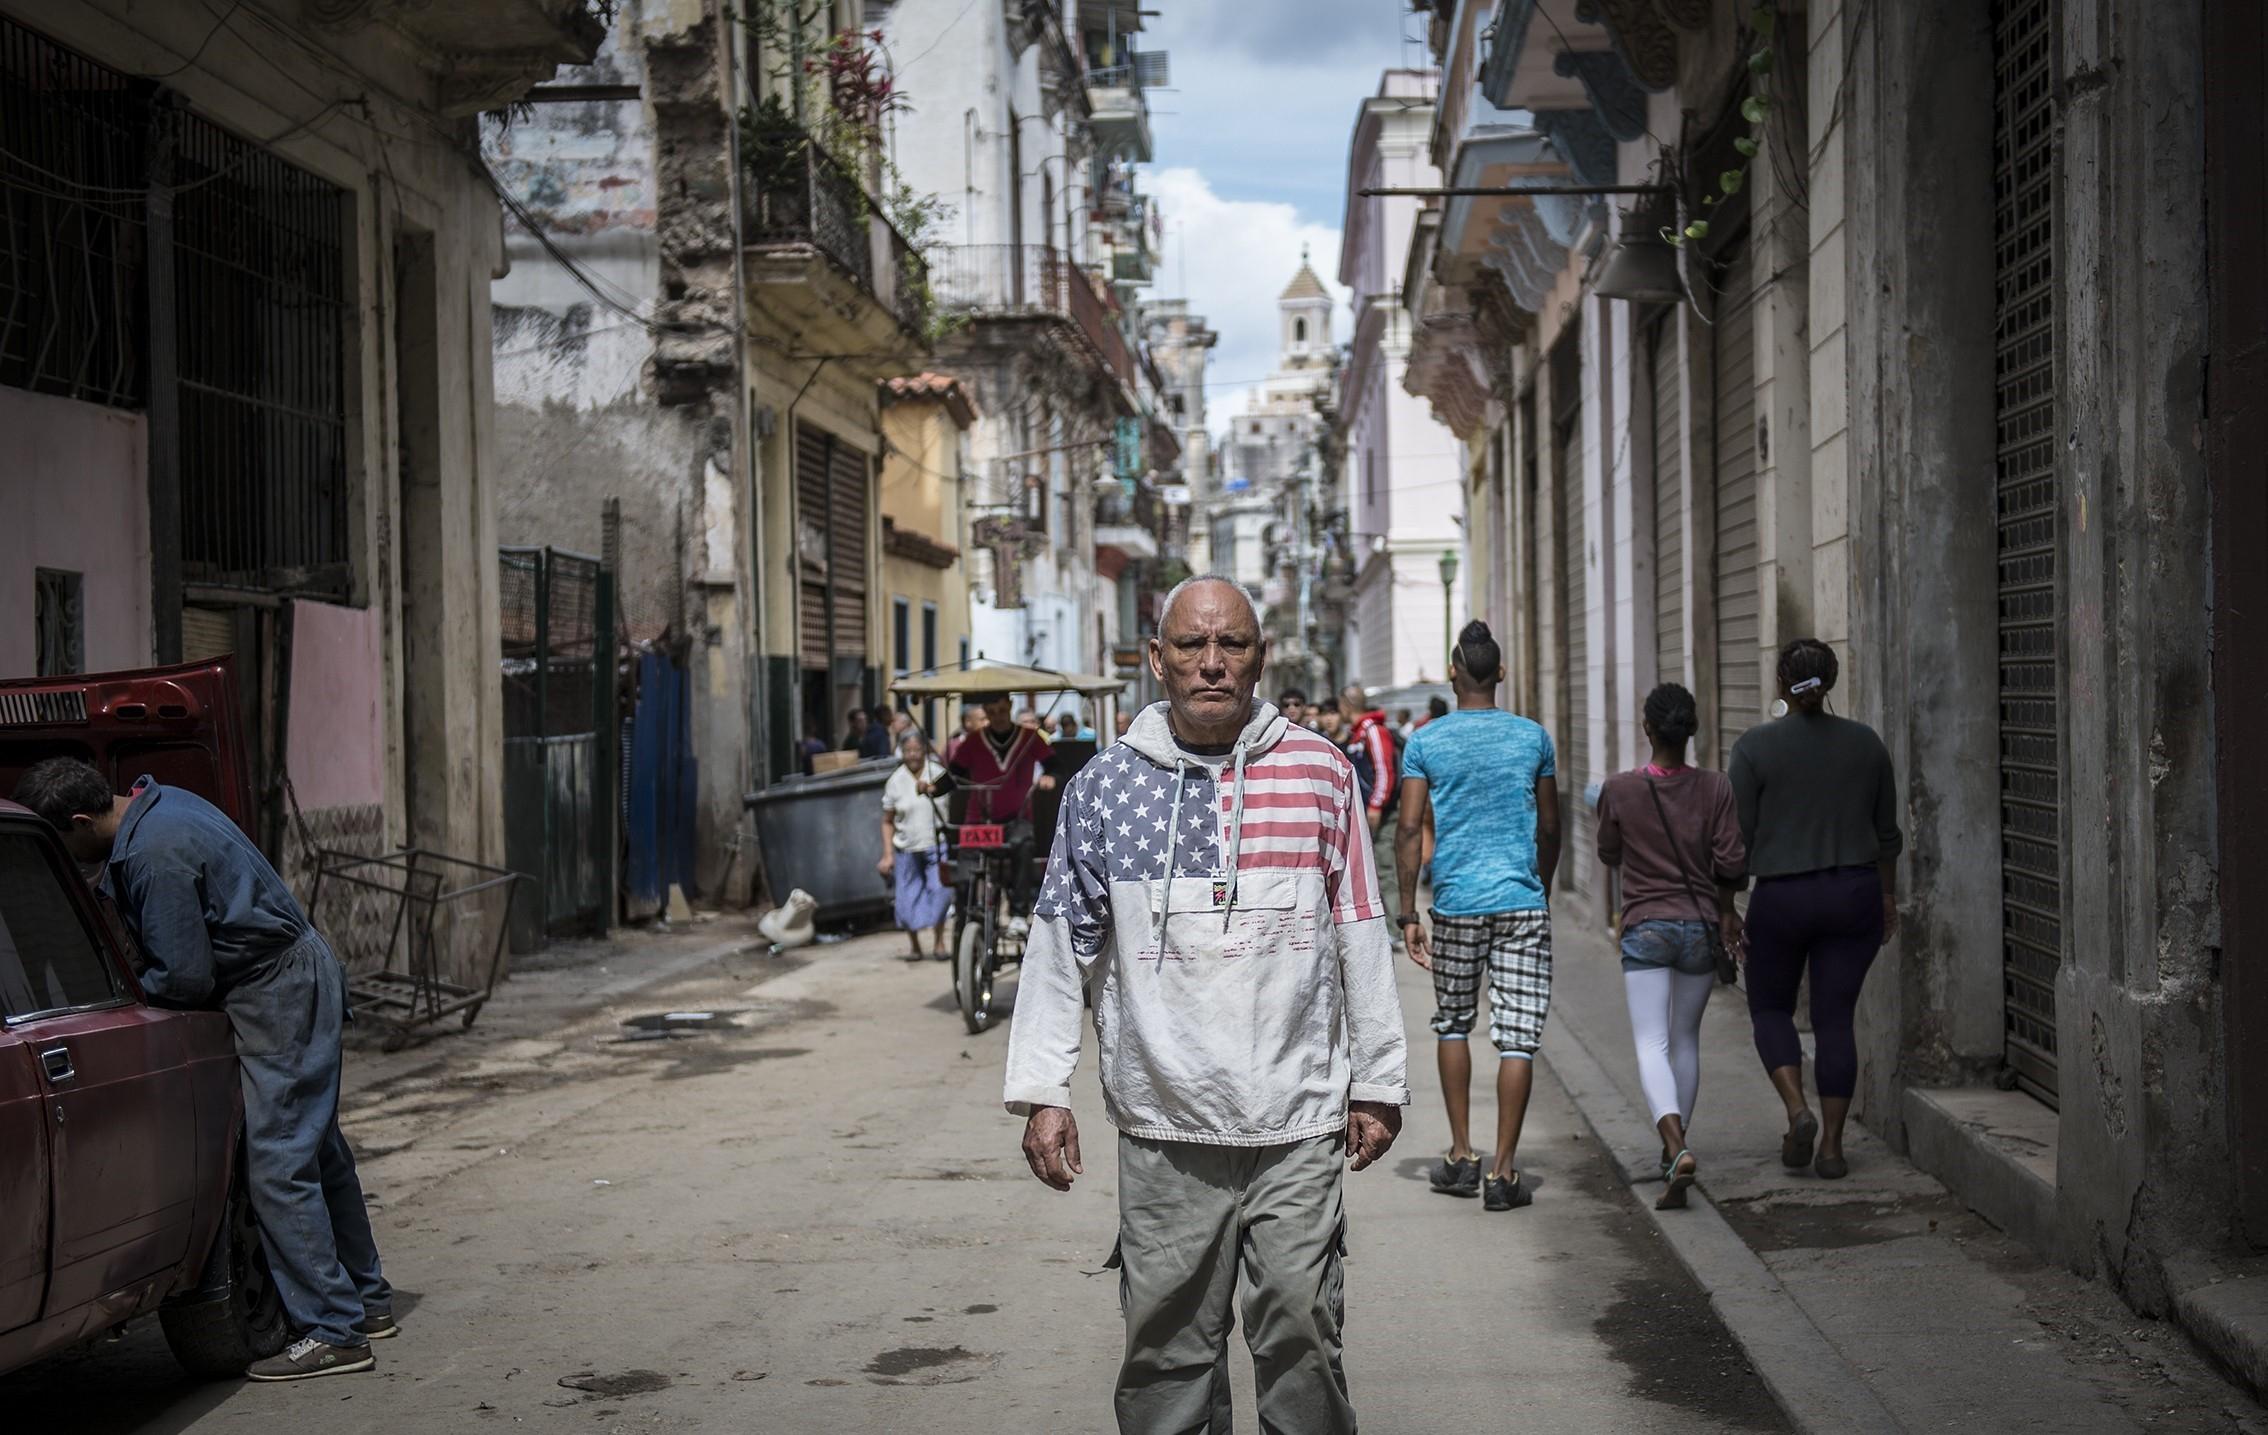 A man with American flag sweatshirt walking through a street in Havana on Feb. 14, 2015.